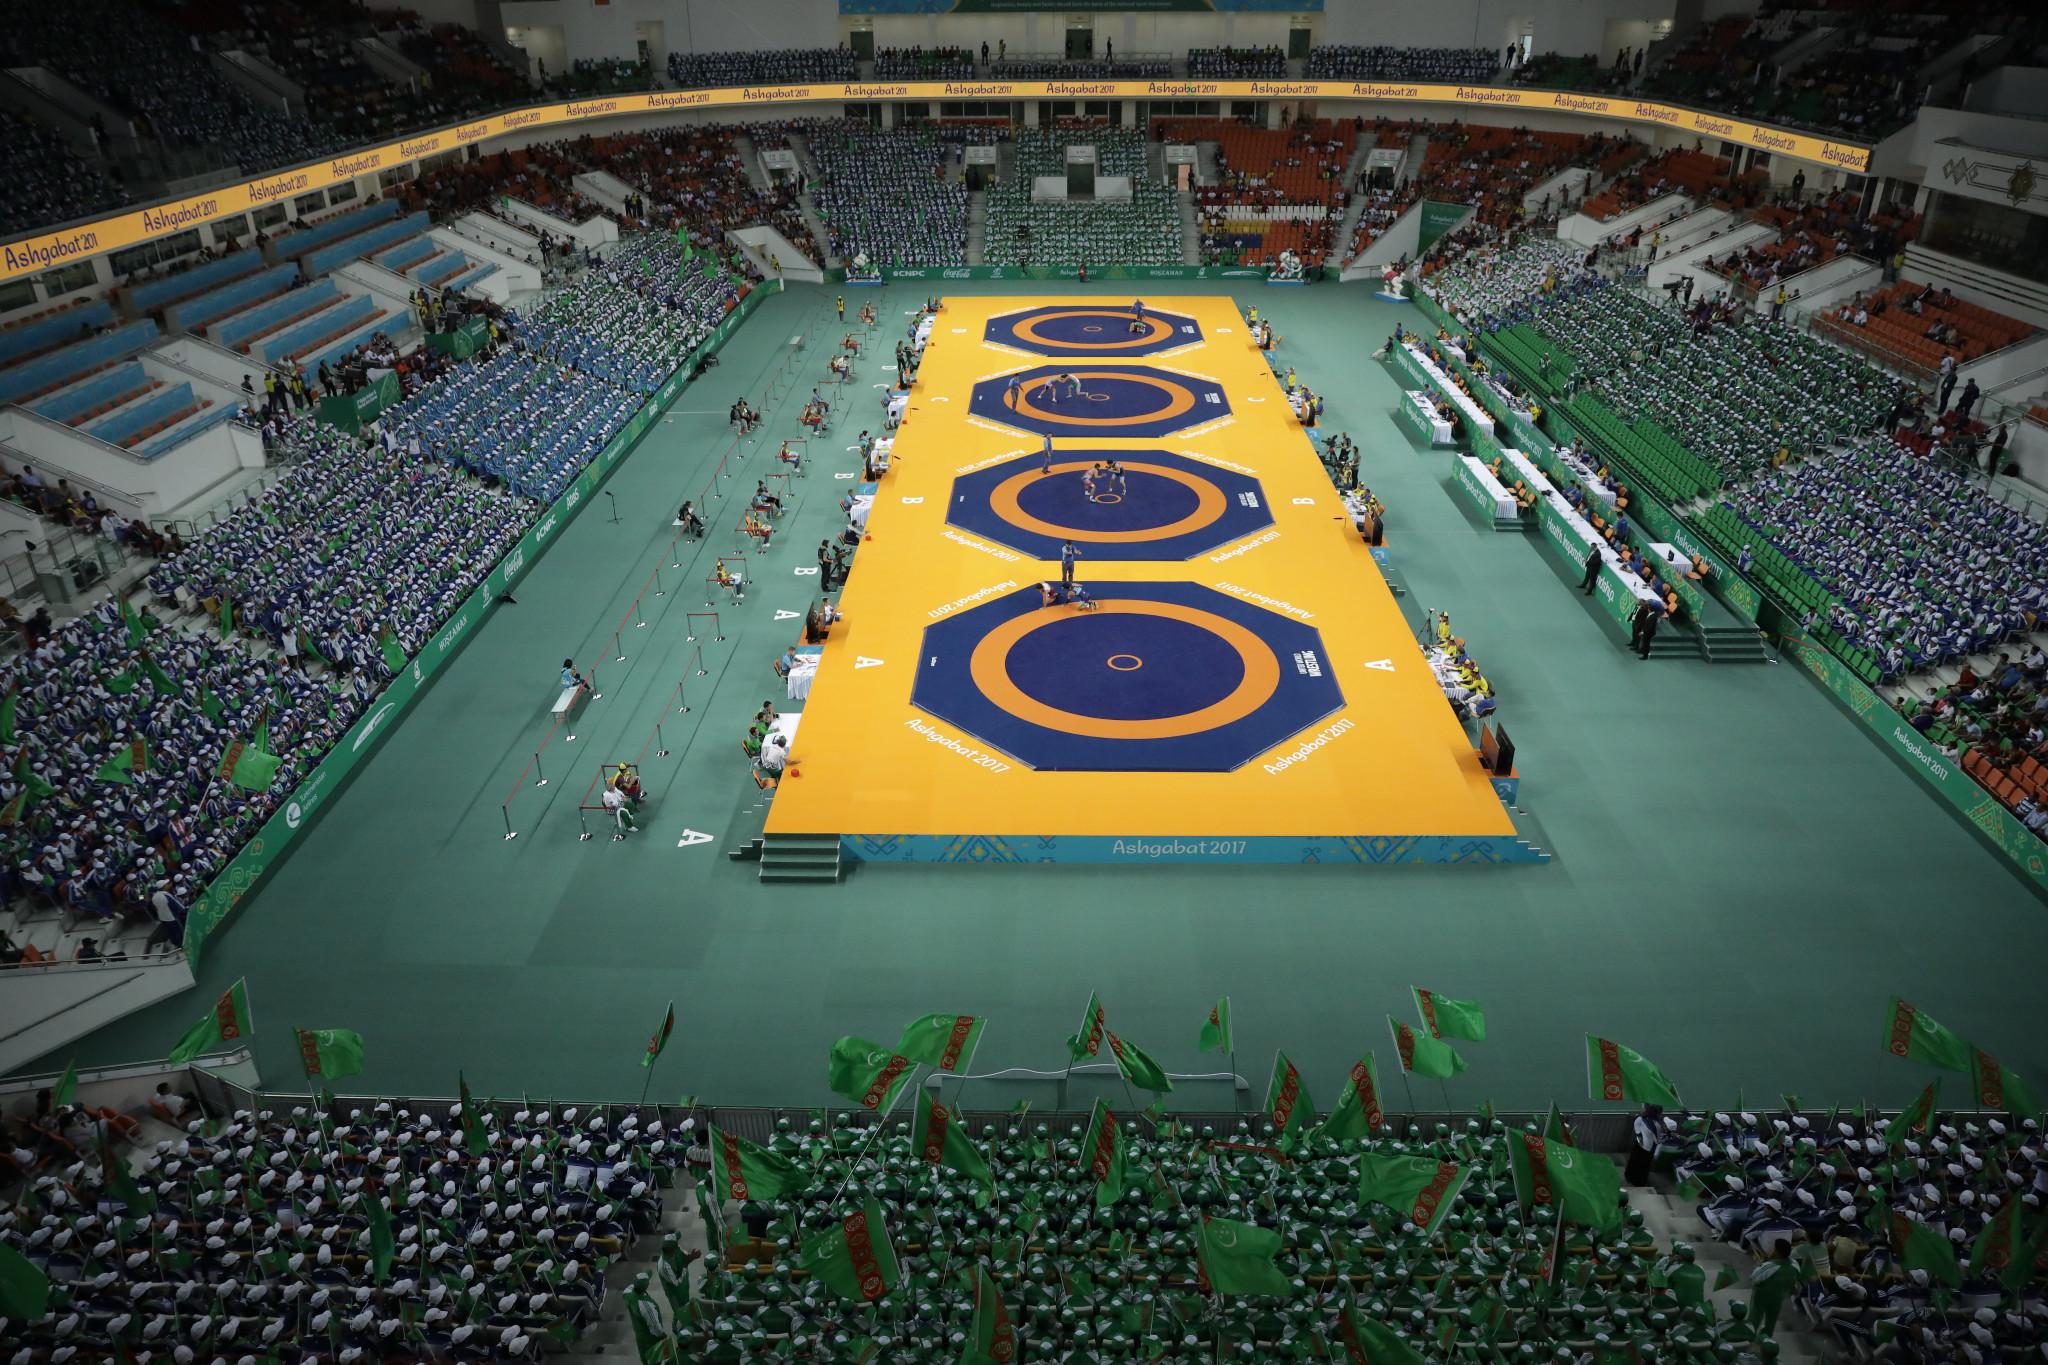 Wrestling competition got underway today ©Ashgabat 2017/Dimitris Tosidis/Laurel Photo Services